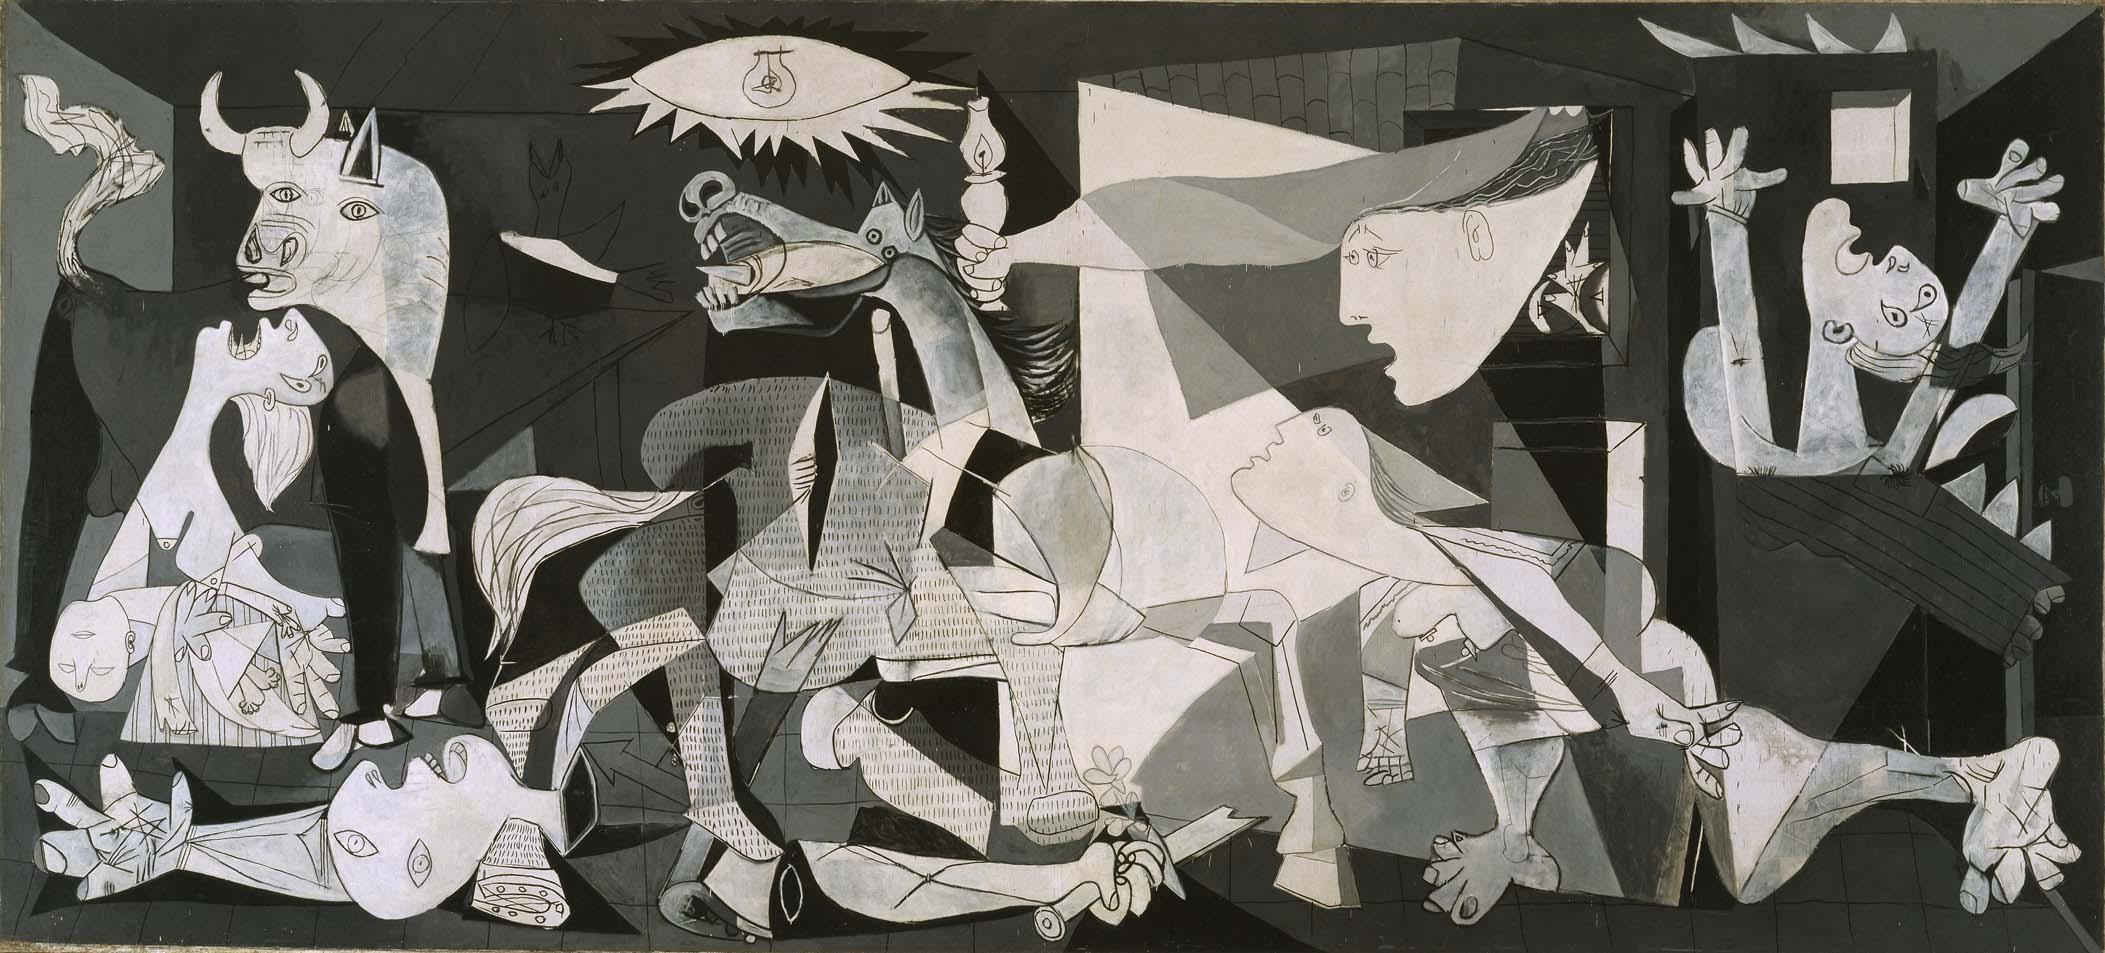 El 'Guernica' - Pablo Picasso, 1937 -  Museo Nacional Centro de Arte Reina Sofía, Madrid